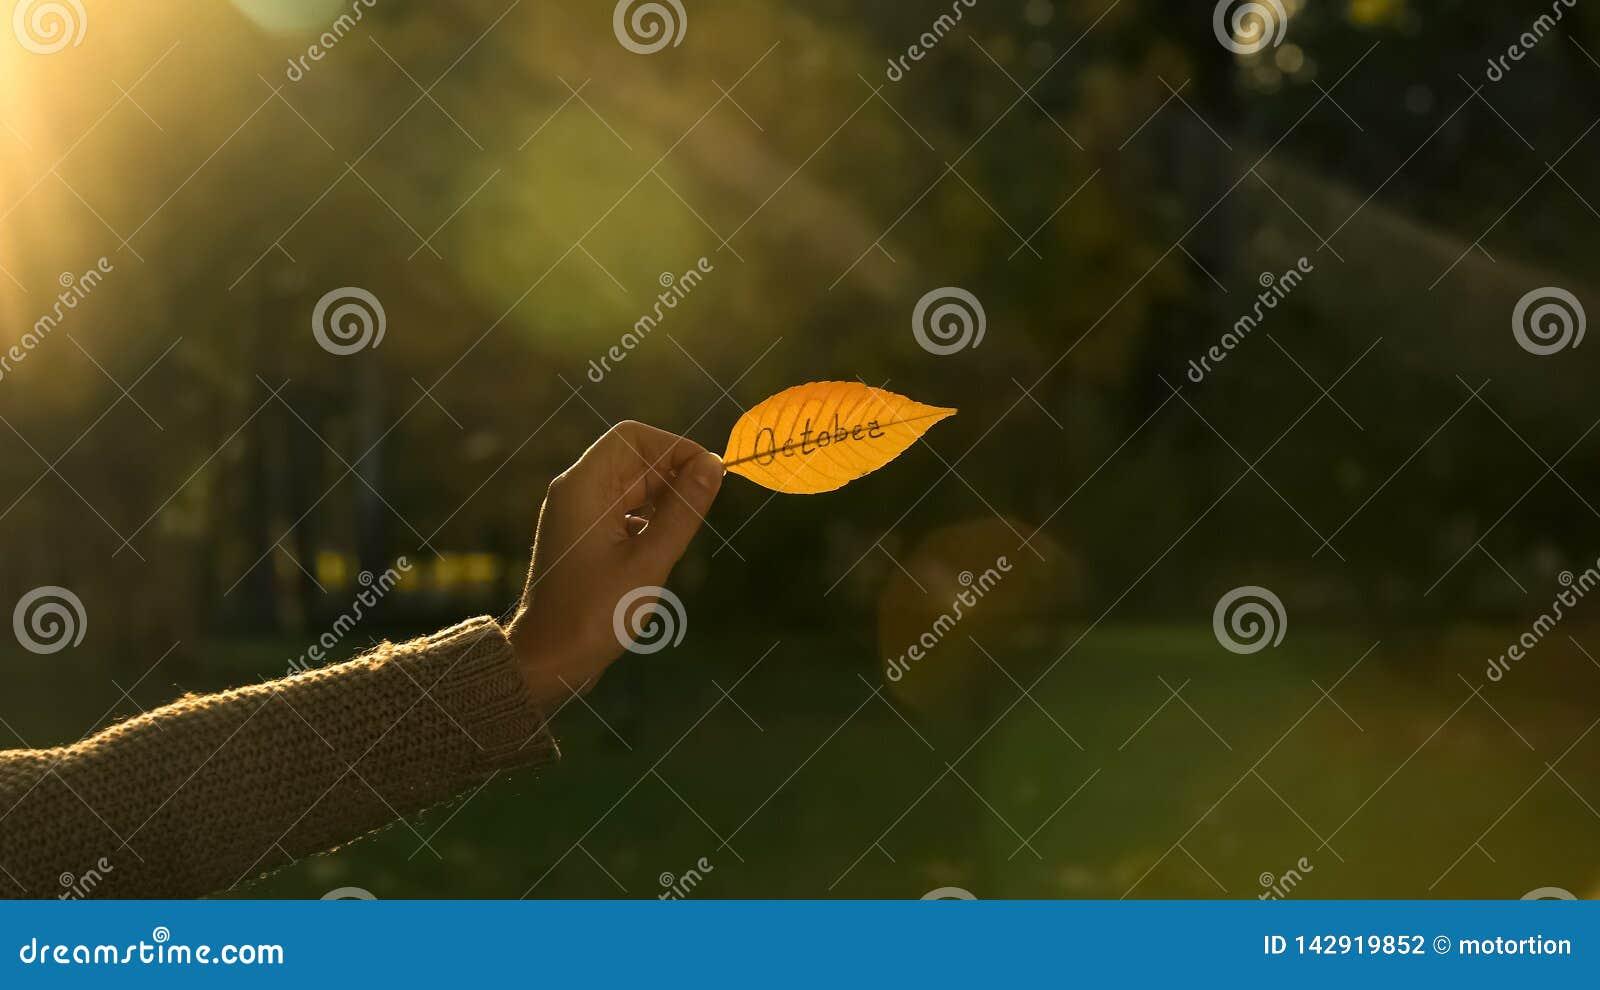 October written on golden autumn leaf, hand holding writings, bright fall season